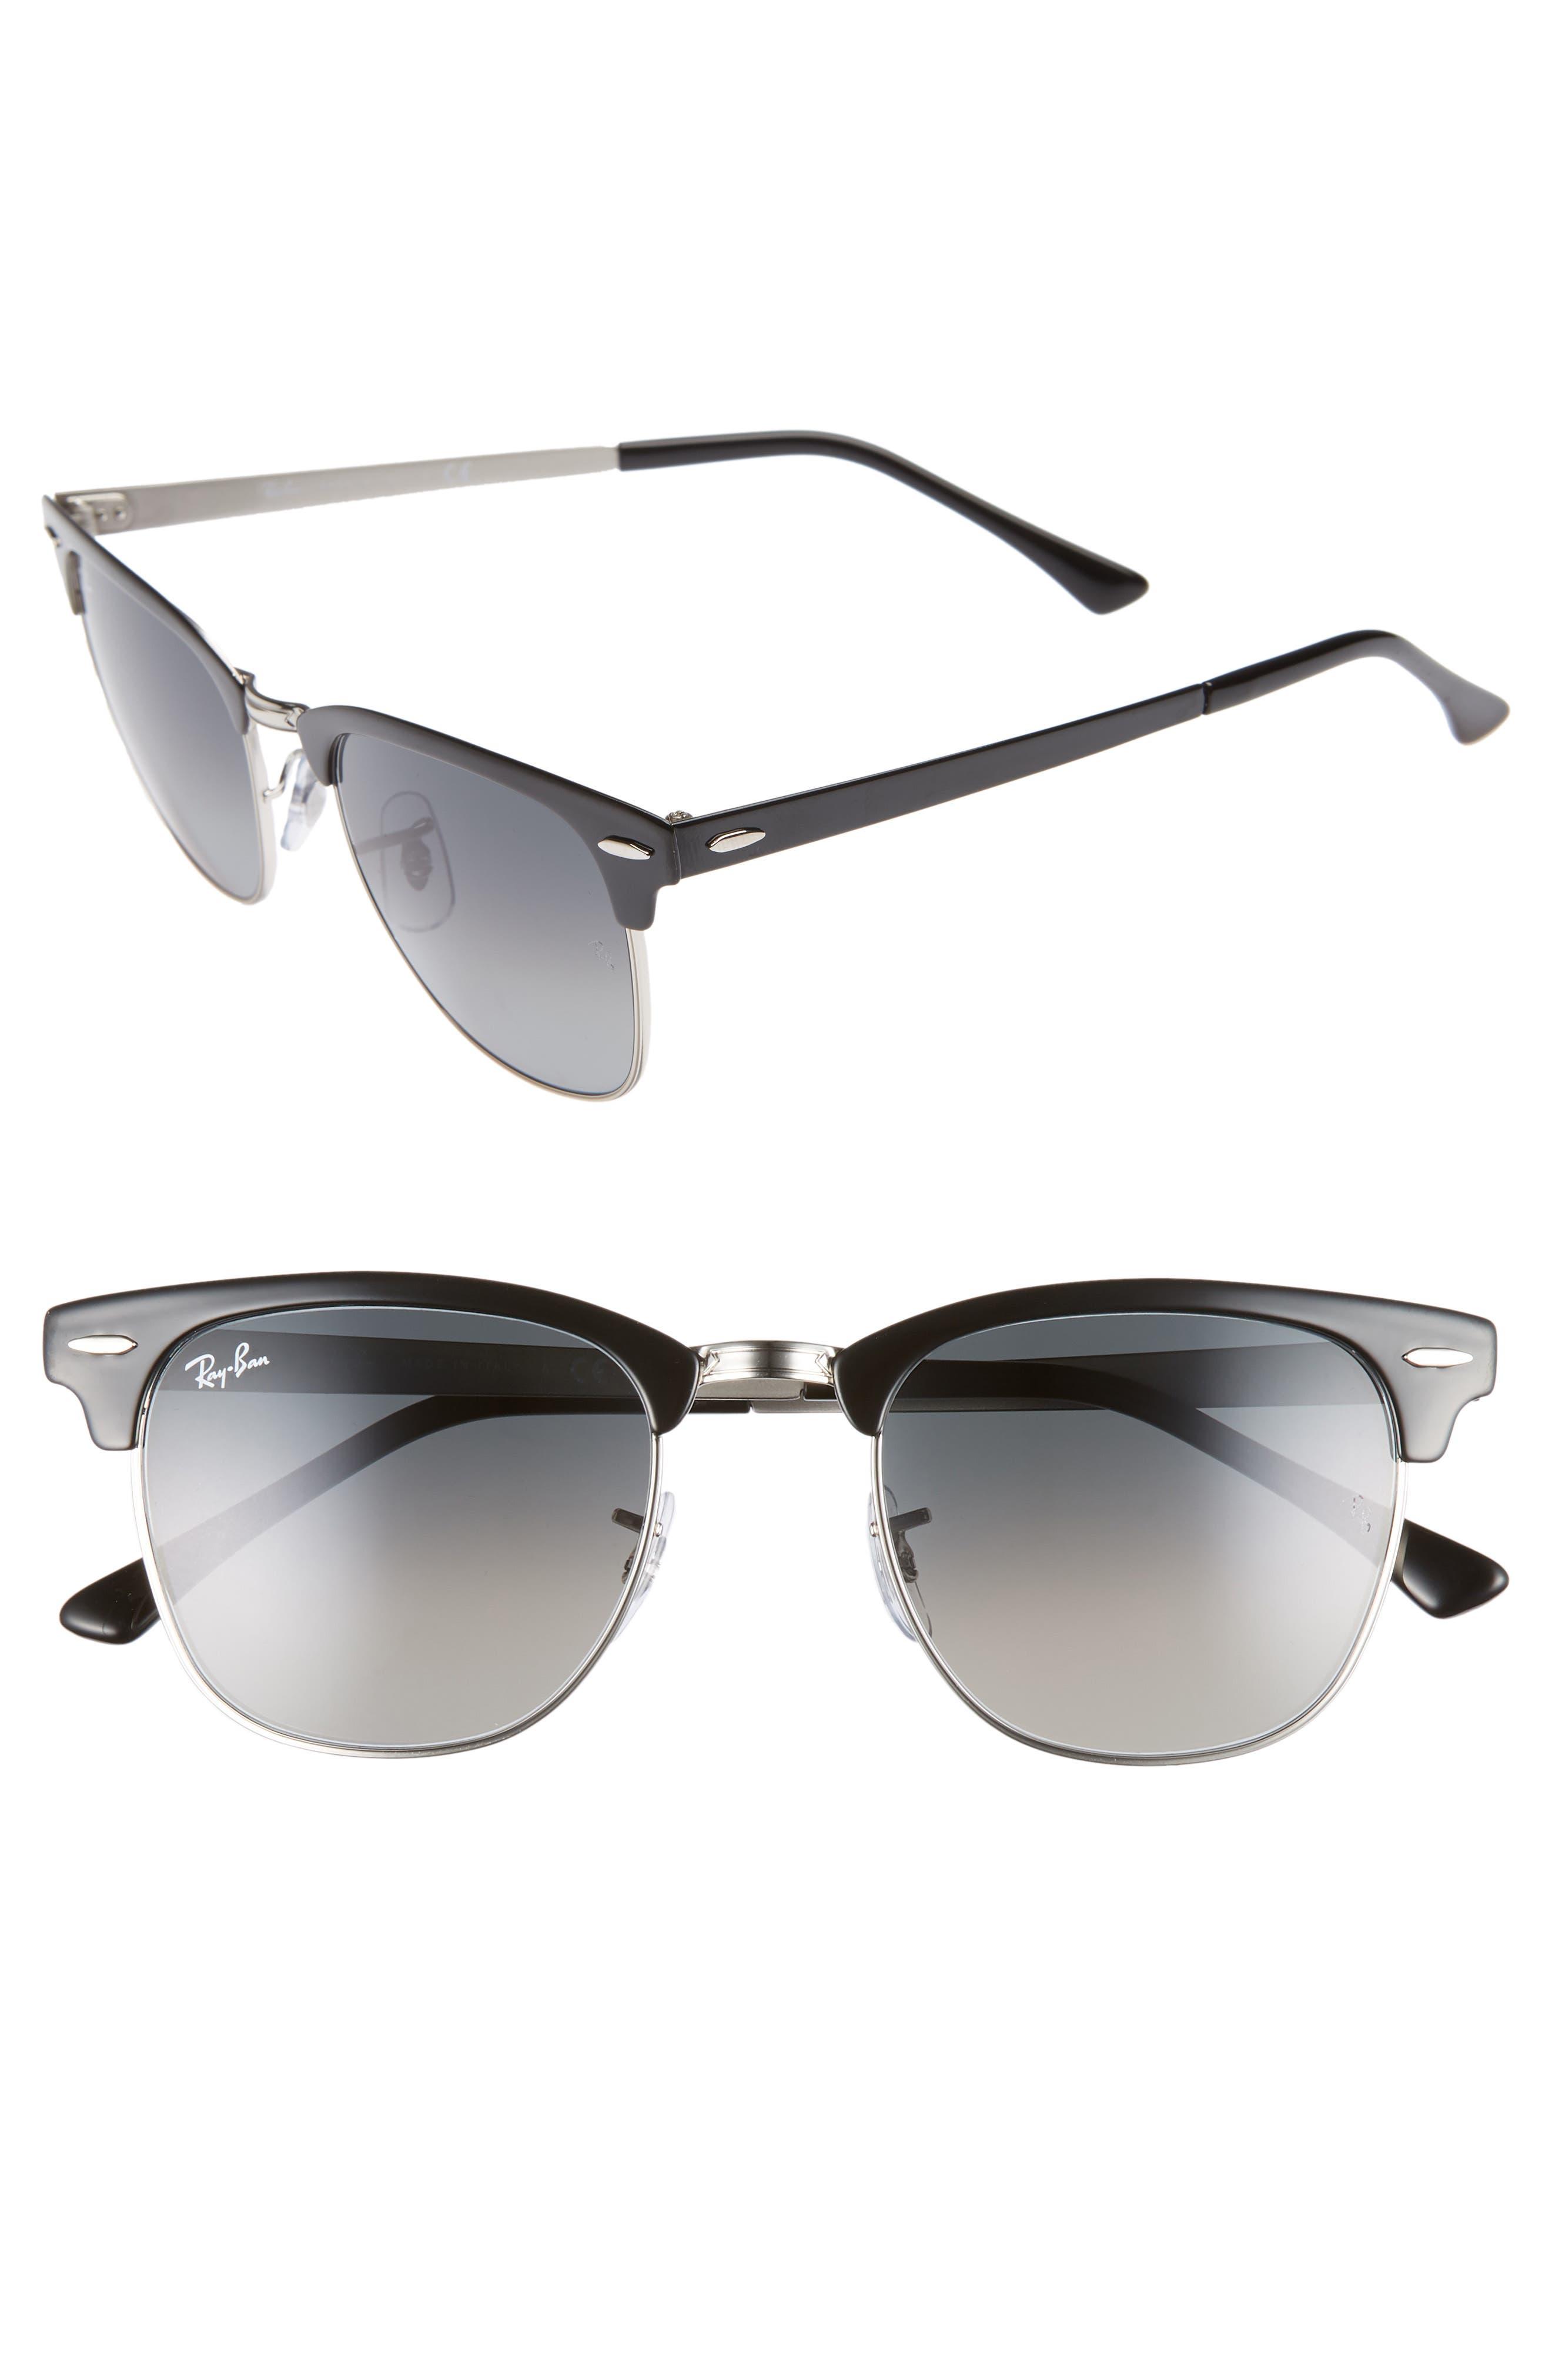 Ray-Ban Icons 51Mm Browline Sunglasses - Silver Black